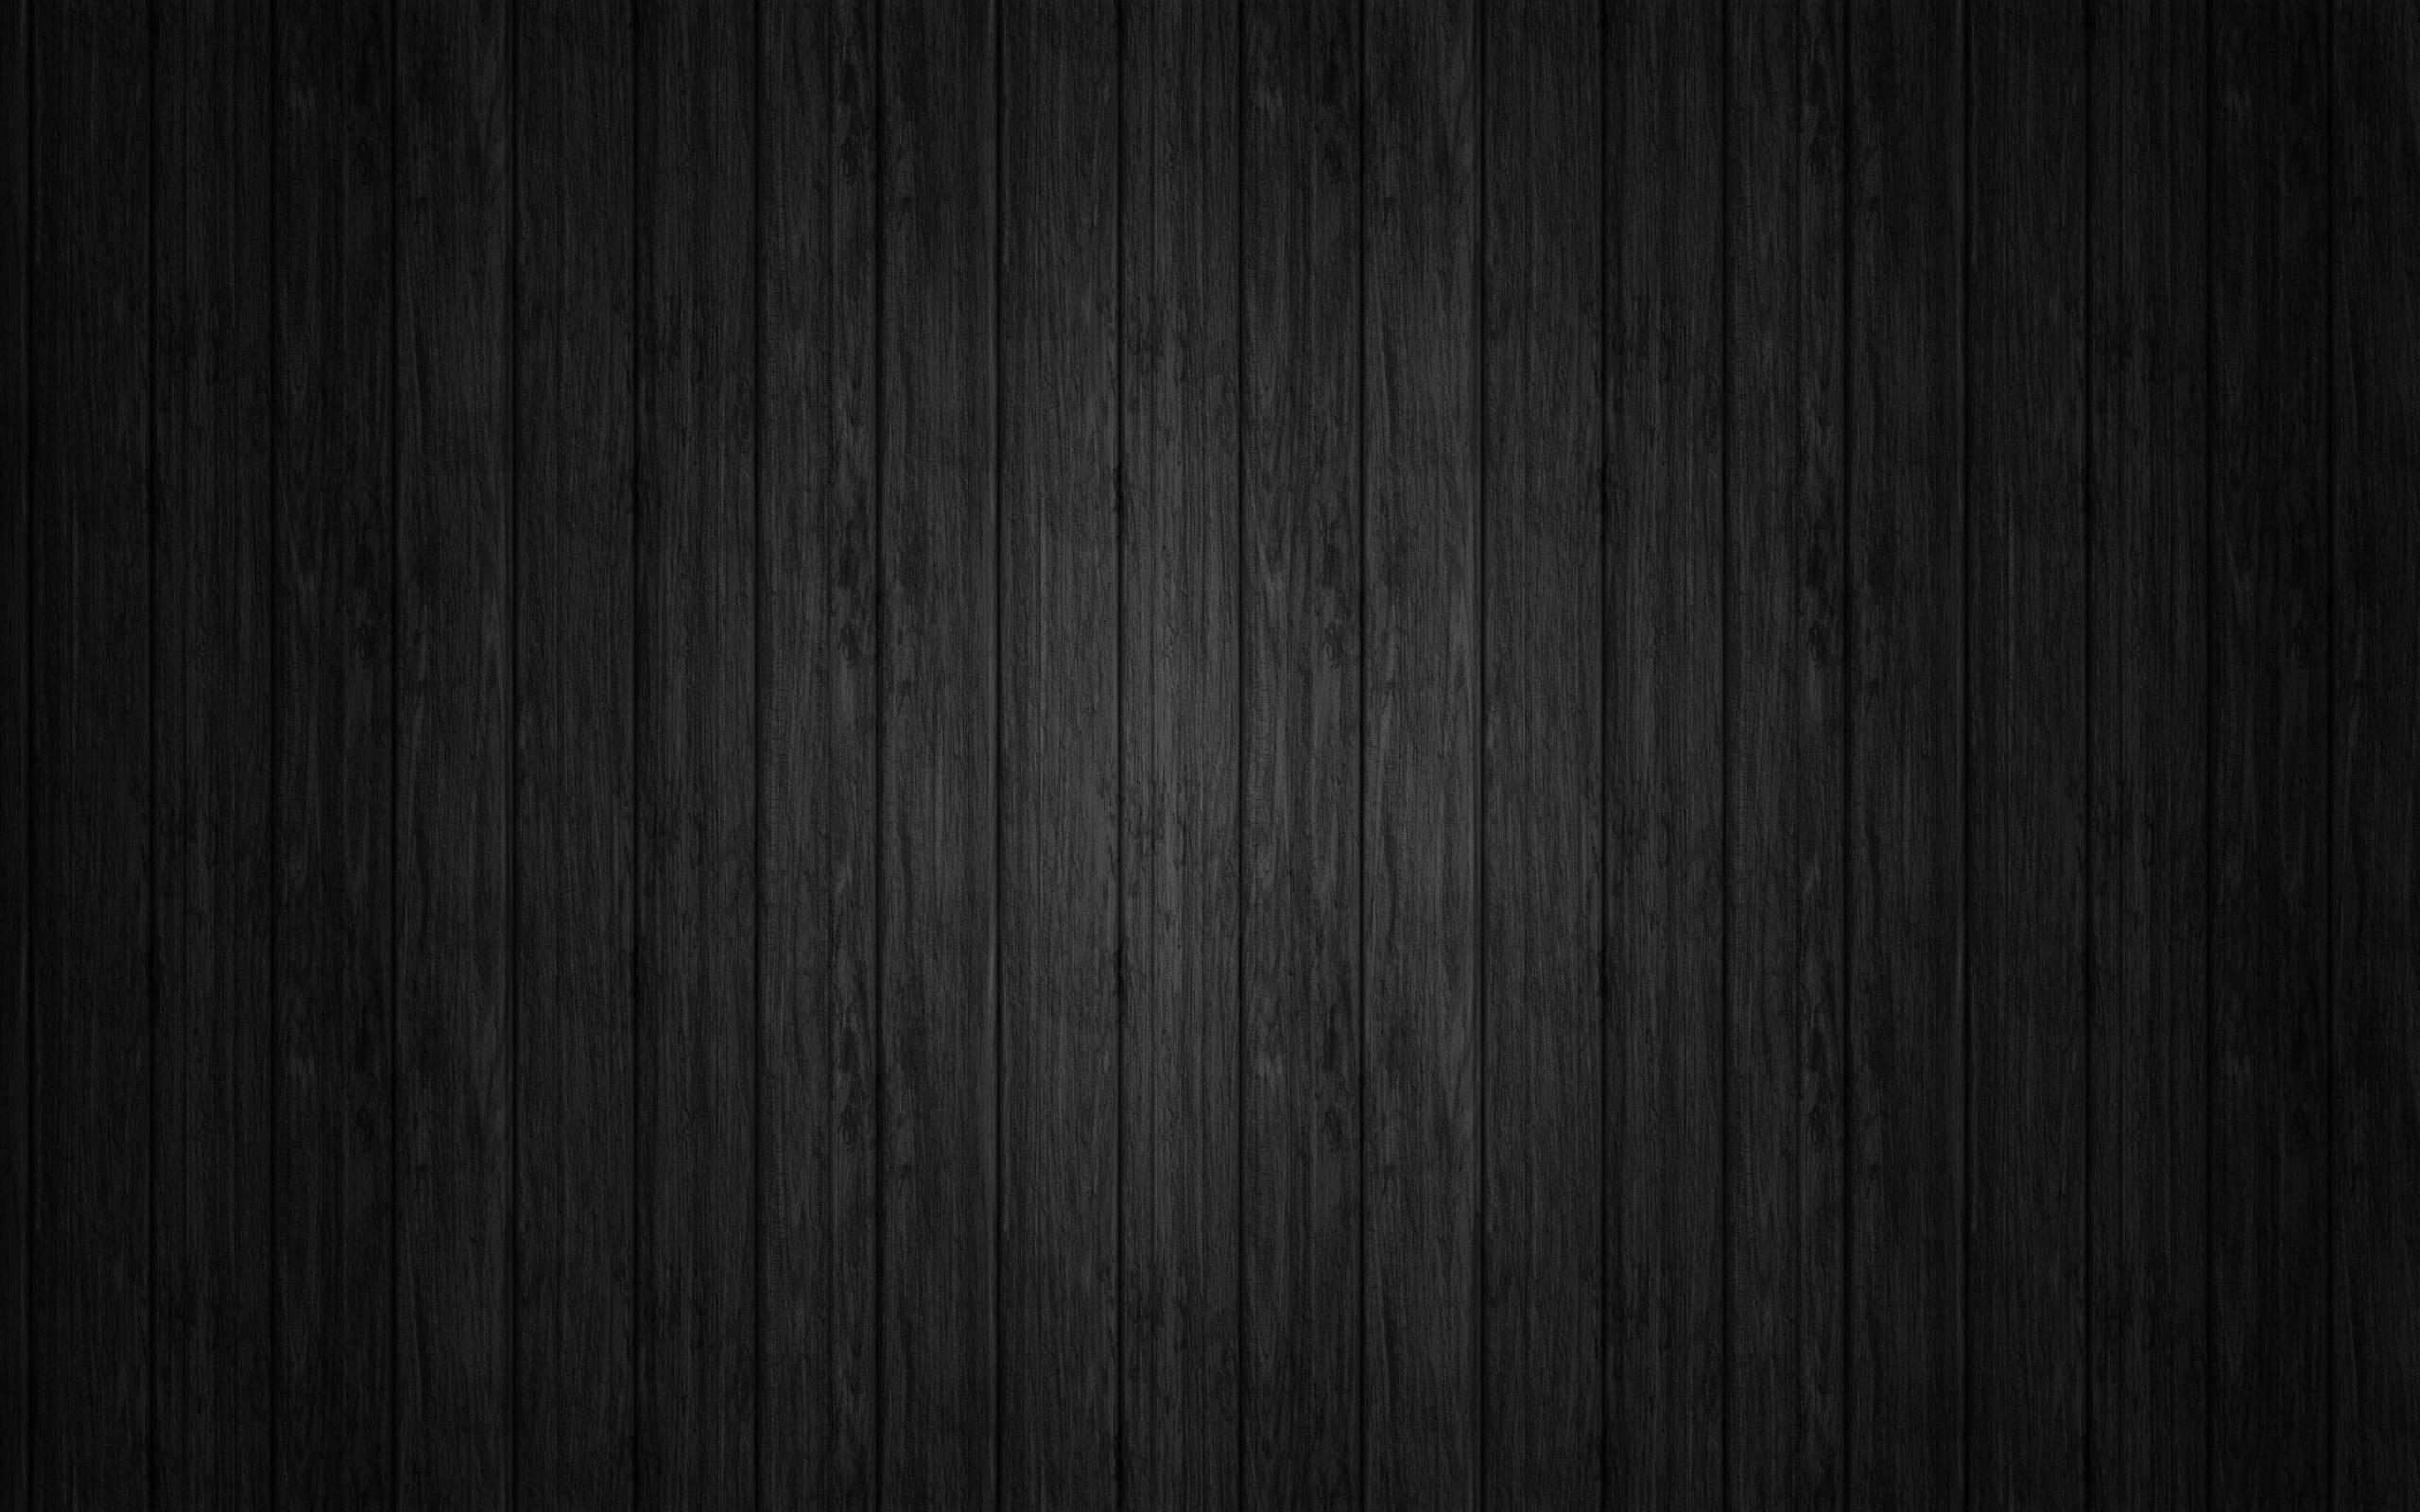 free hd black image